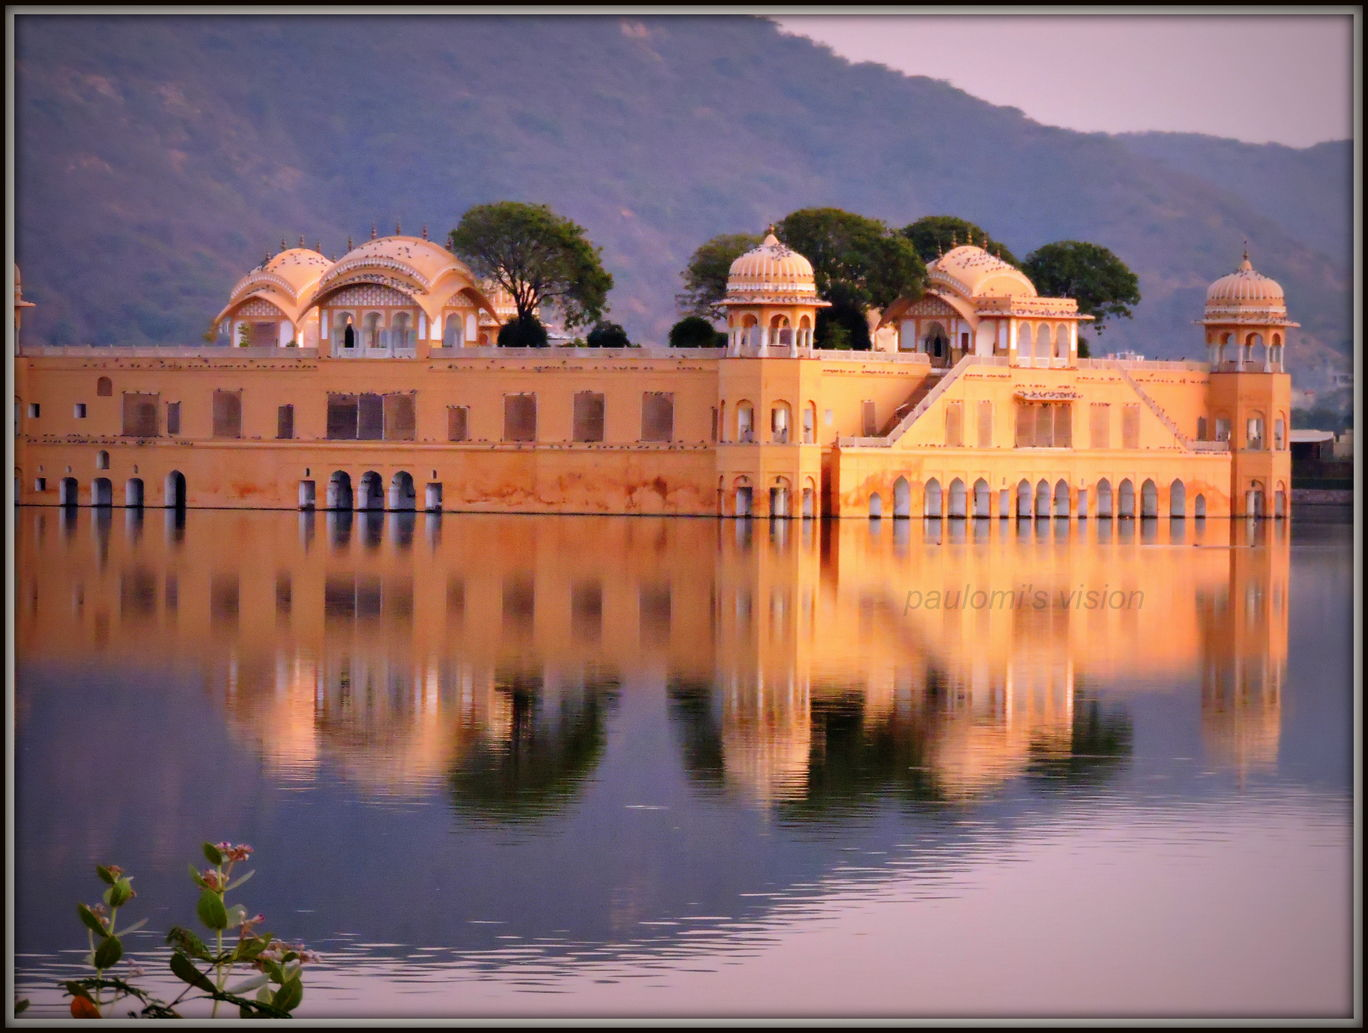 Photo of Jaipur By Paulomi Guha